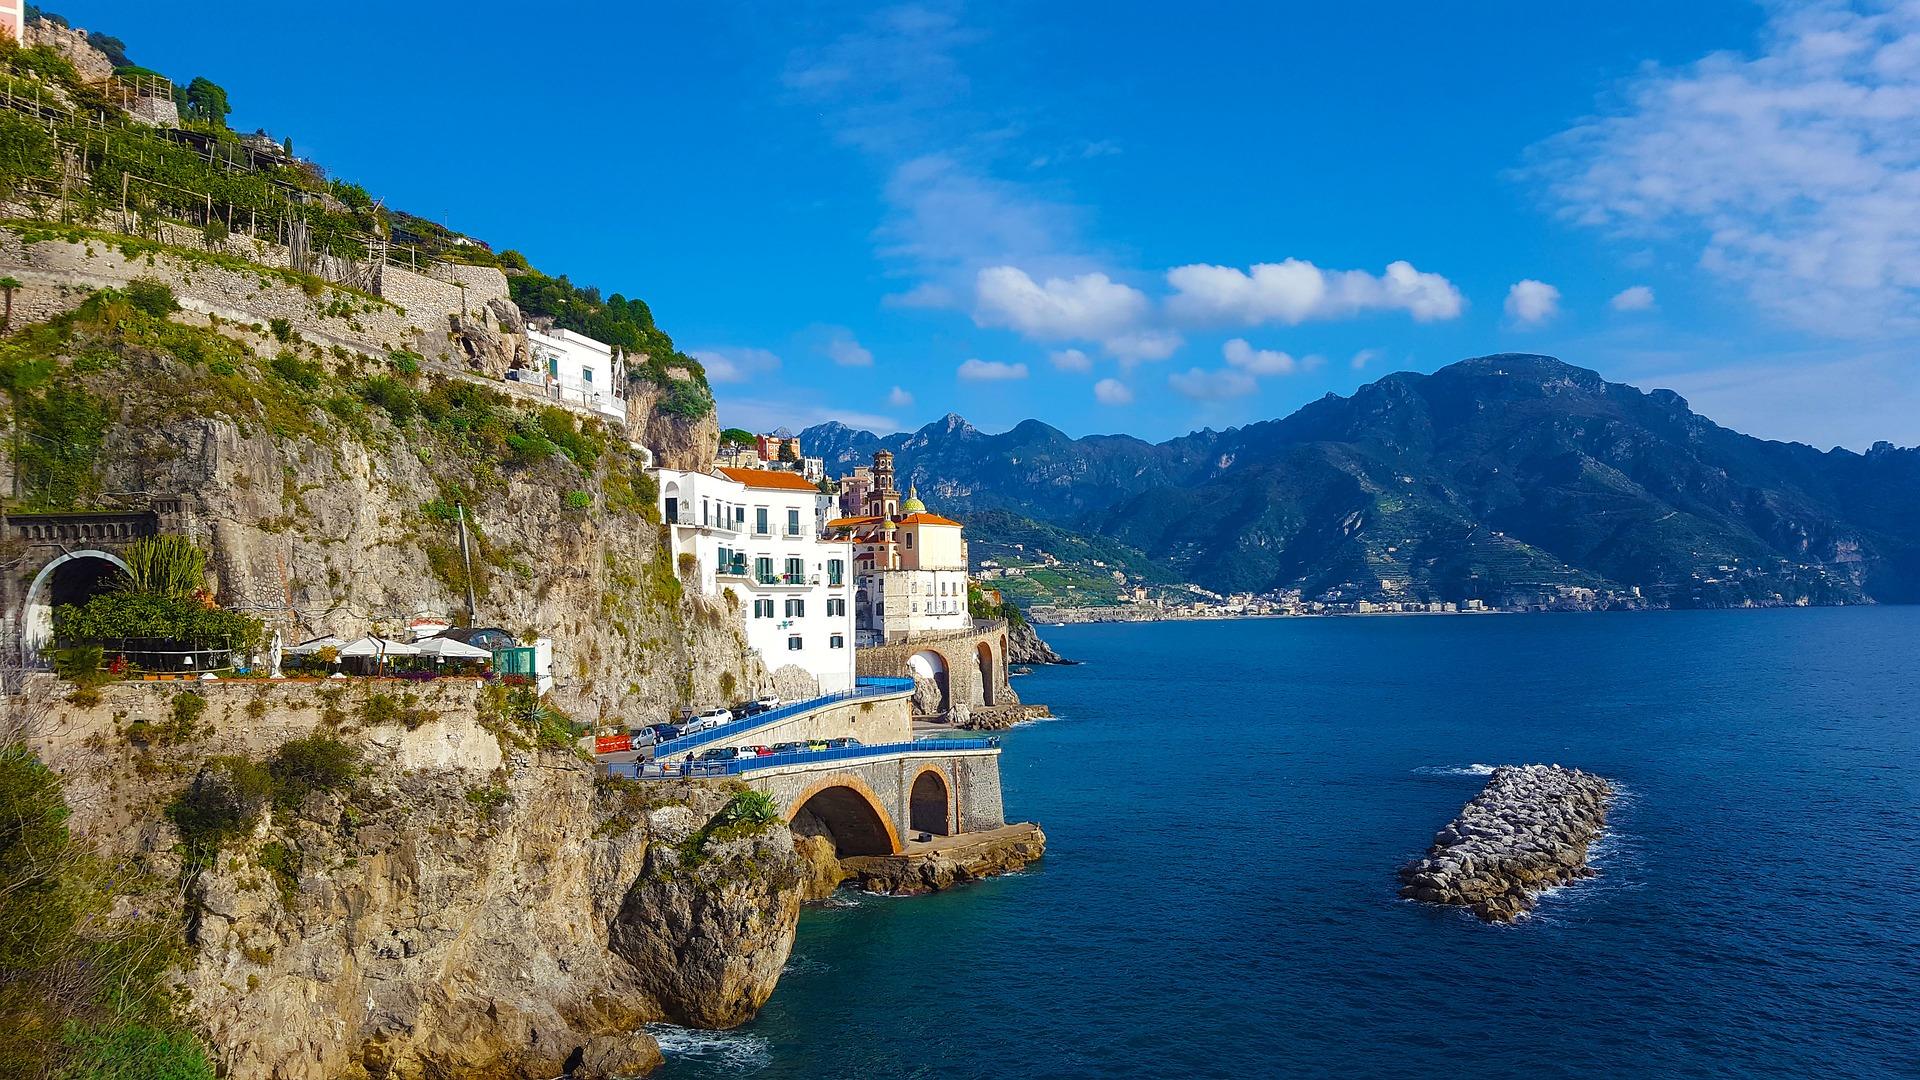 Hotel Sul Mare Costiera Amalfitana